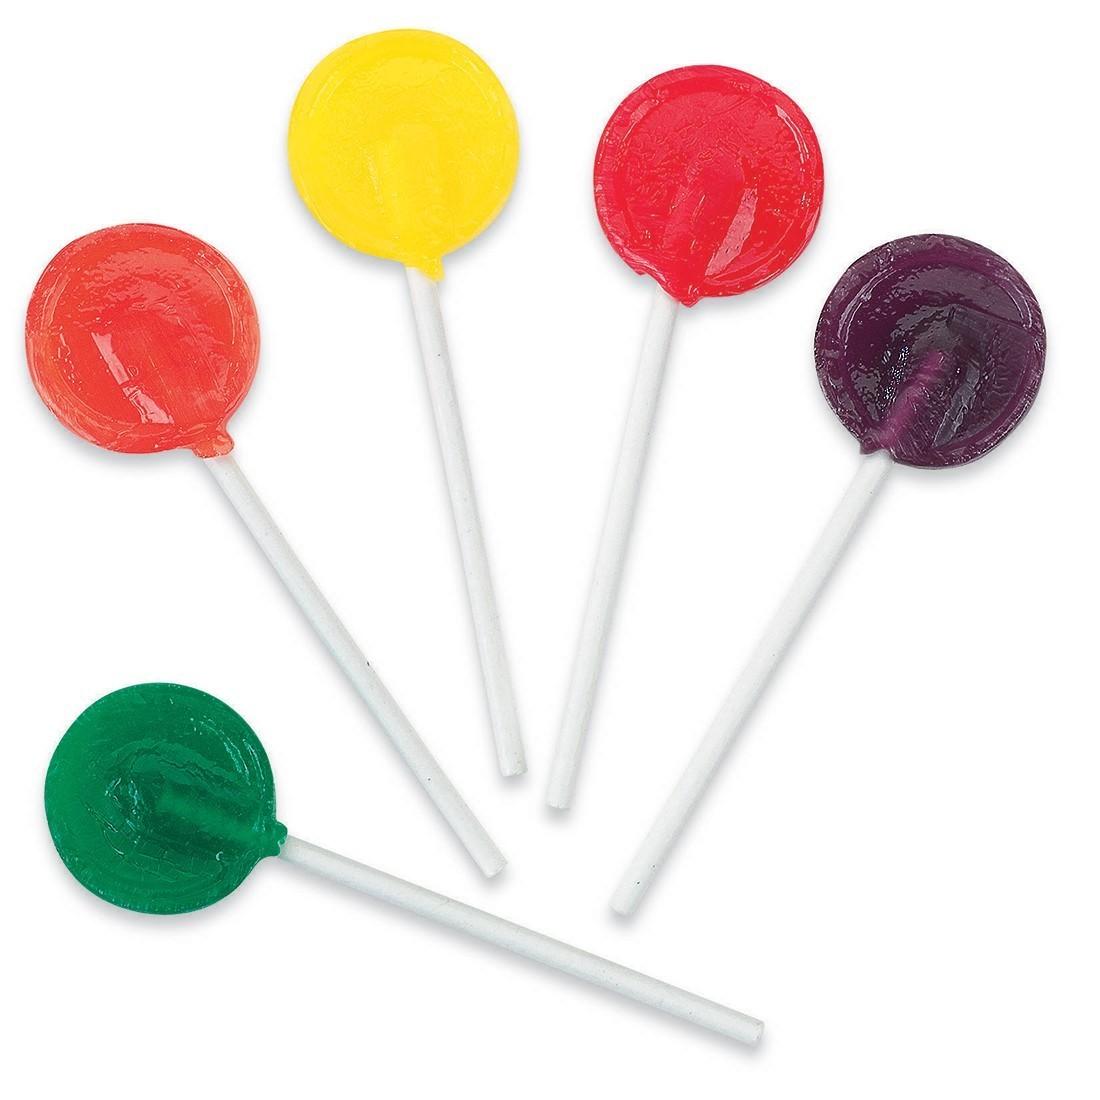 Sugar Free Jolly Pops - 2 lbs. [image]